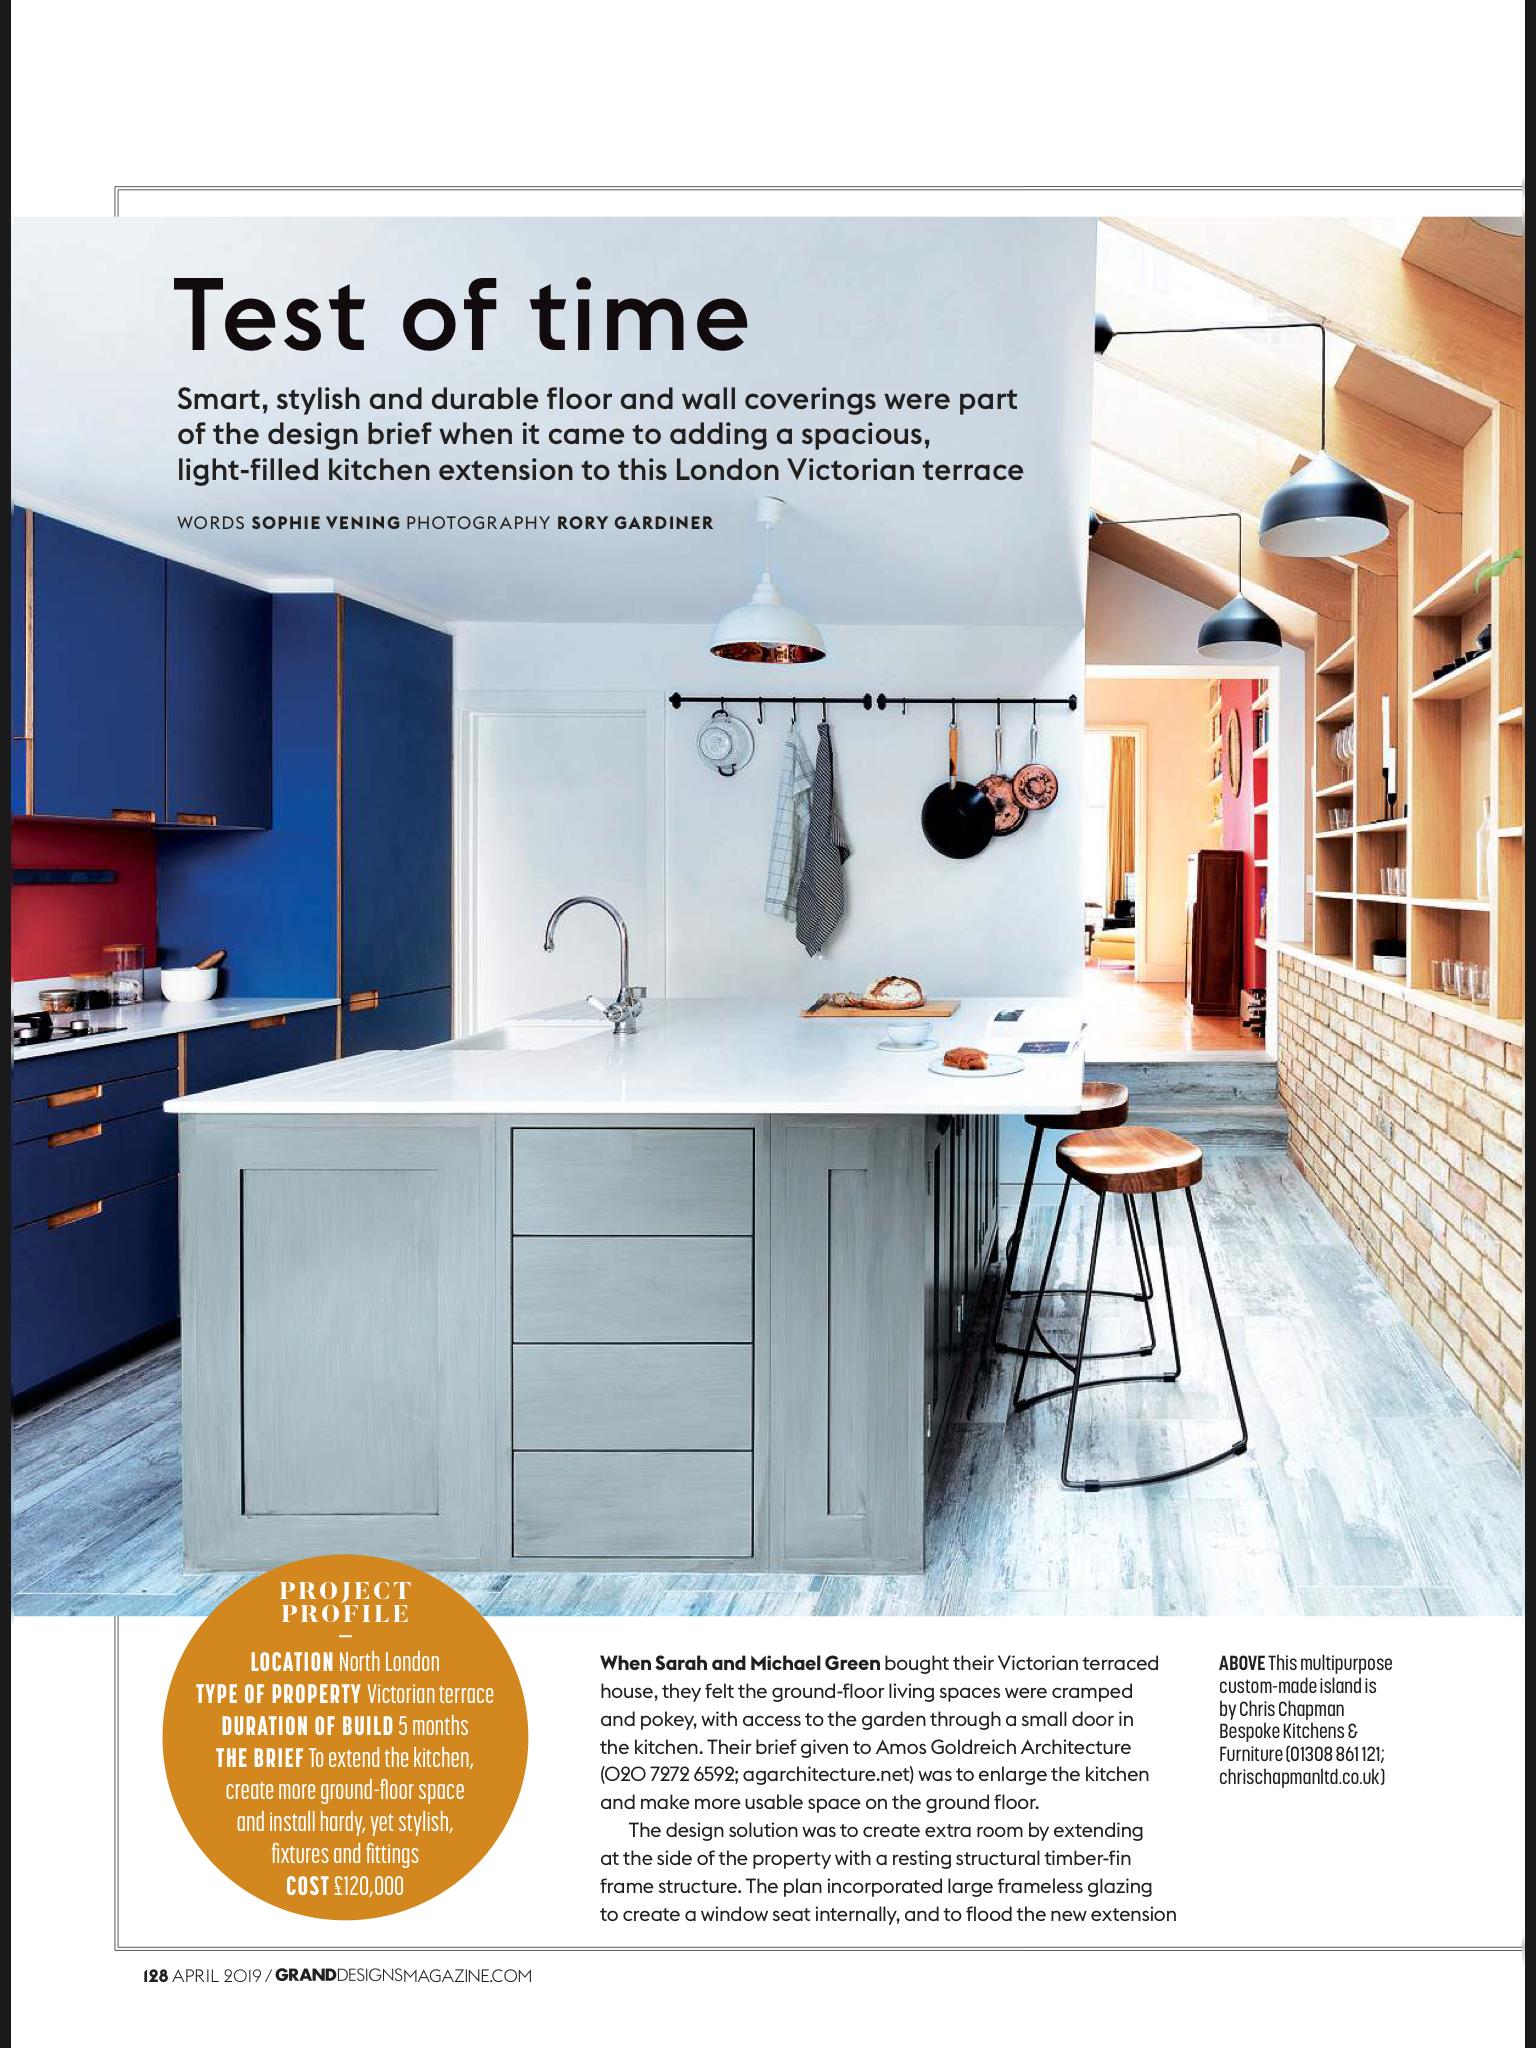 27.02.19 Grand Designs Magazine